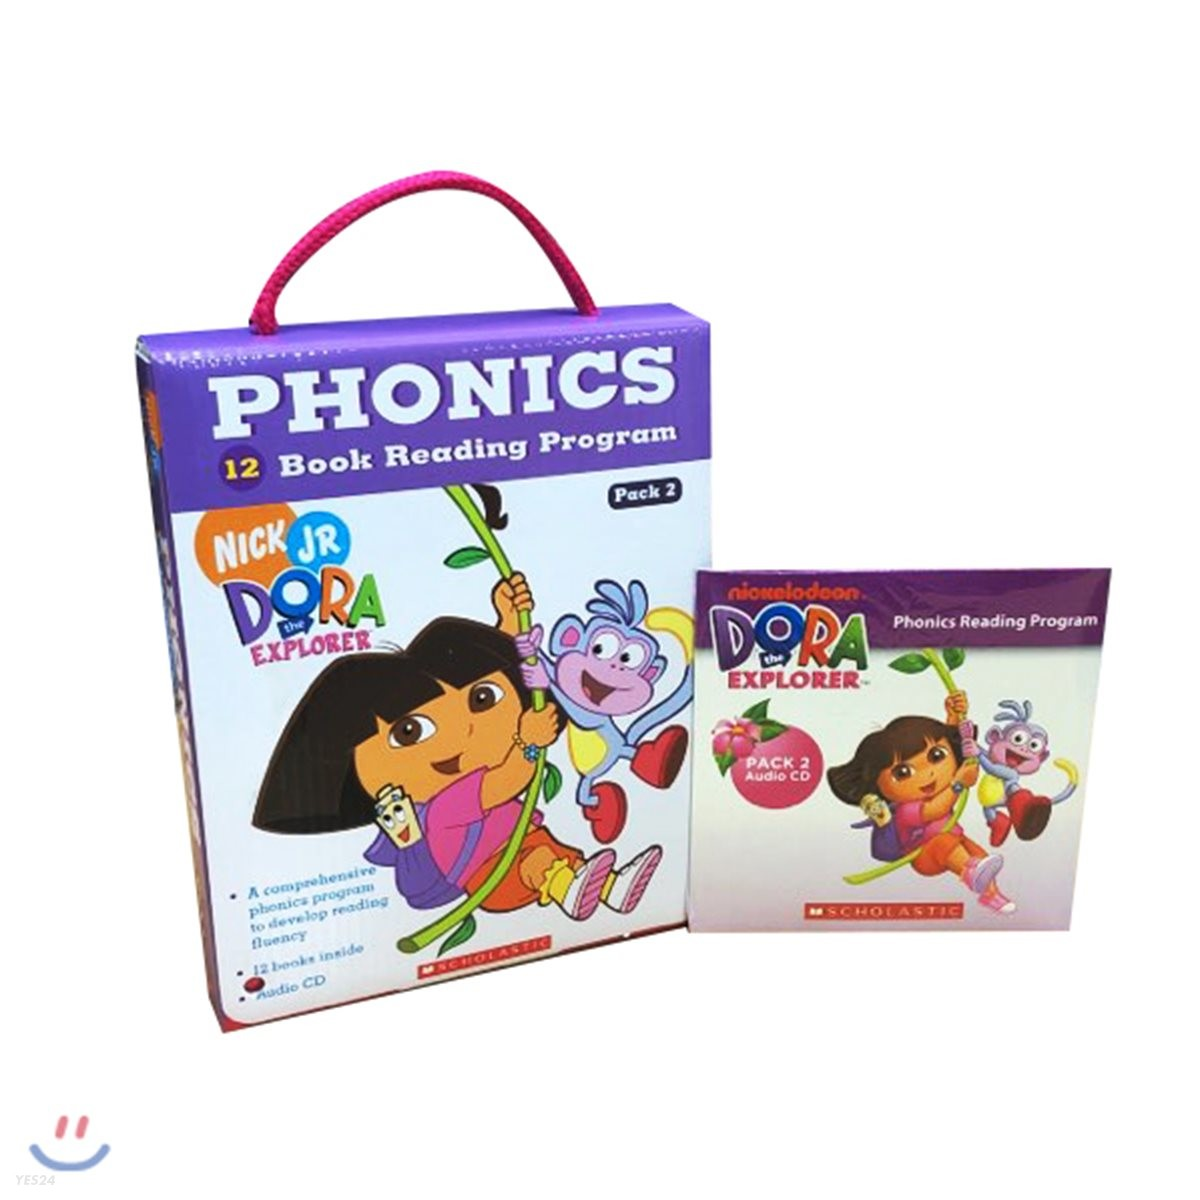 Dora The Explorer Phonics Fun Pack 2 with CD : 도라 파닉스 리더스 2